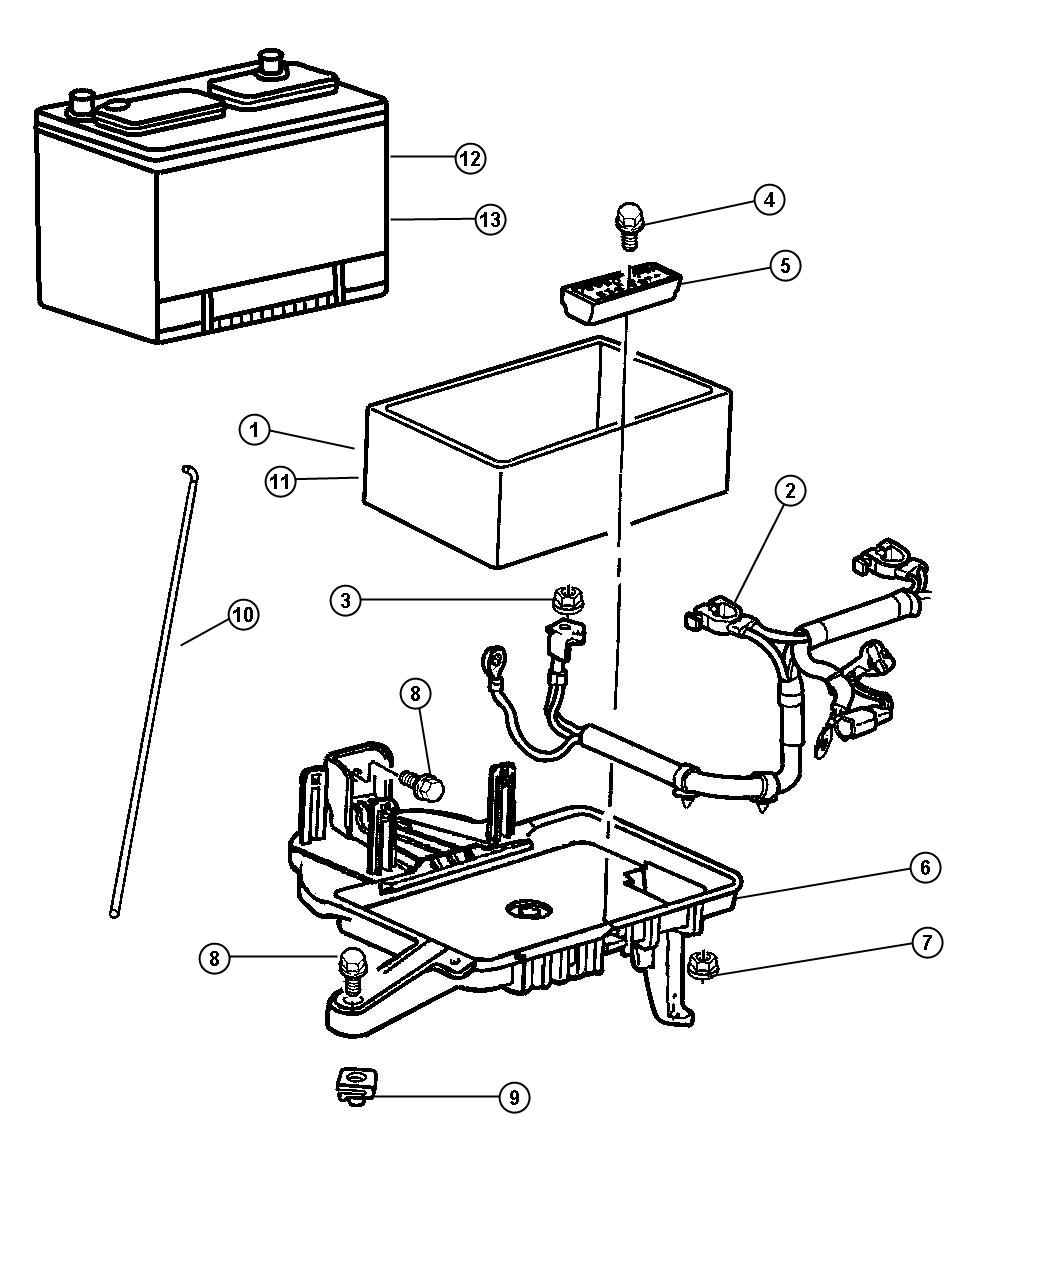 04 Jeep Liberty Wiring Diagram